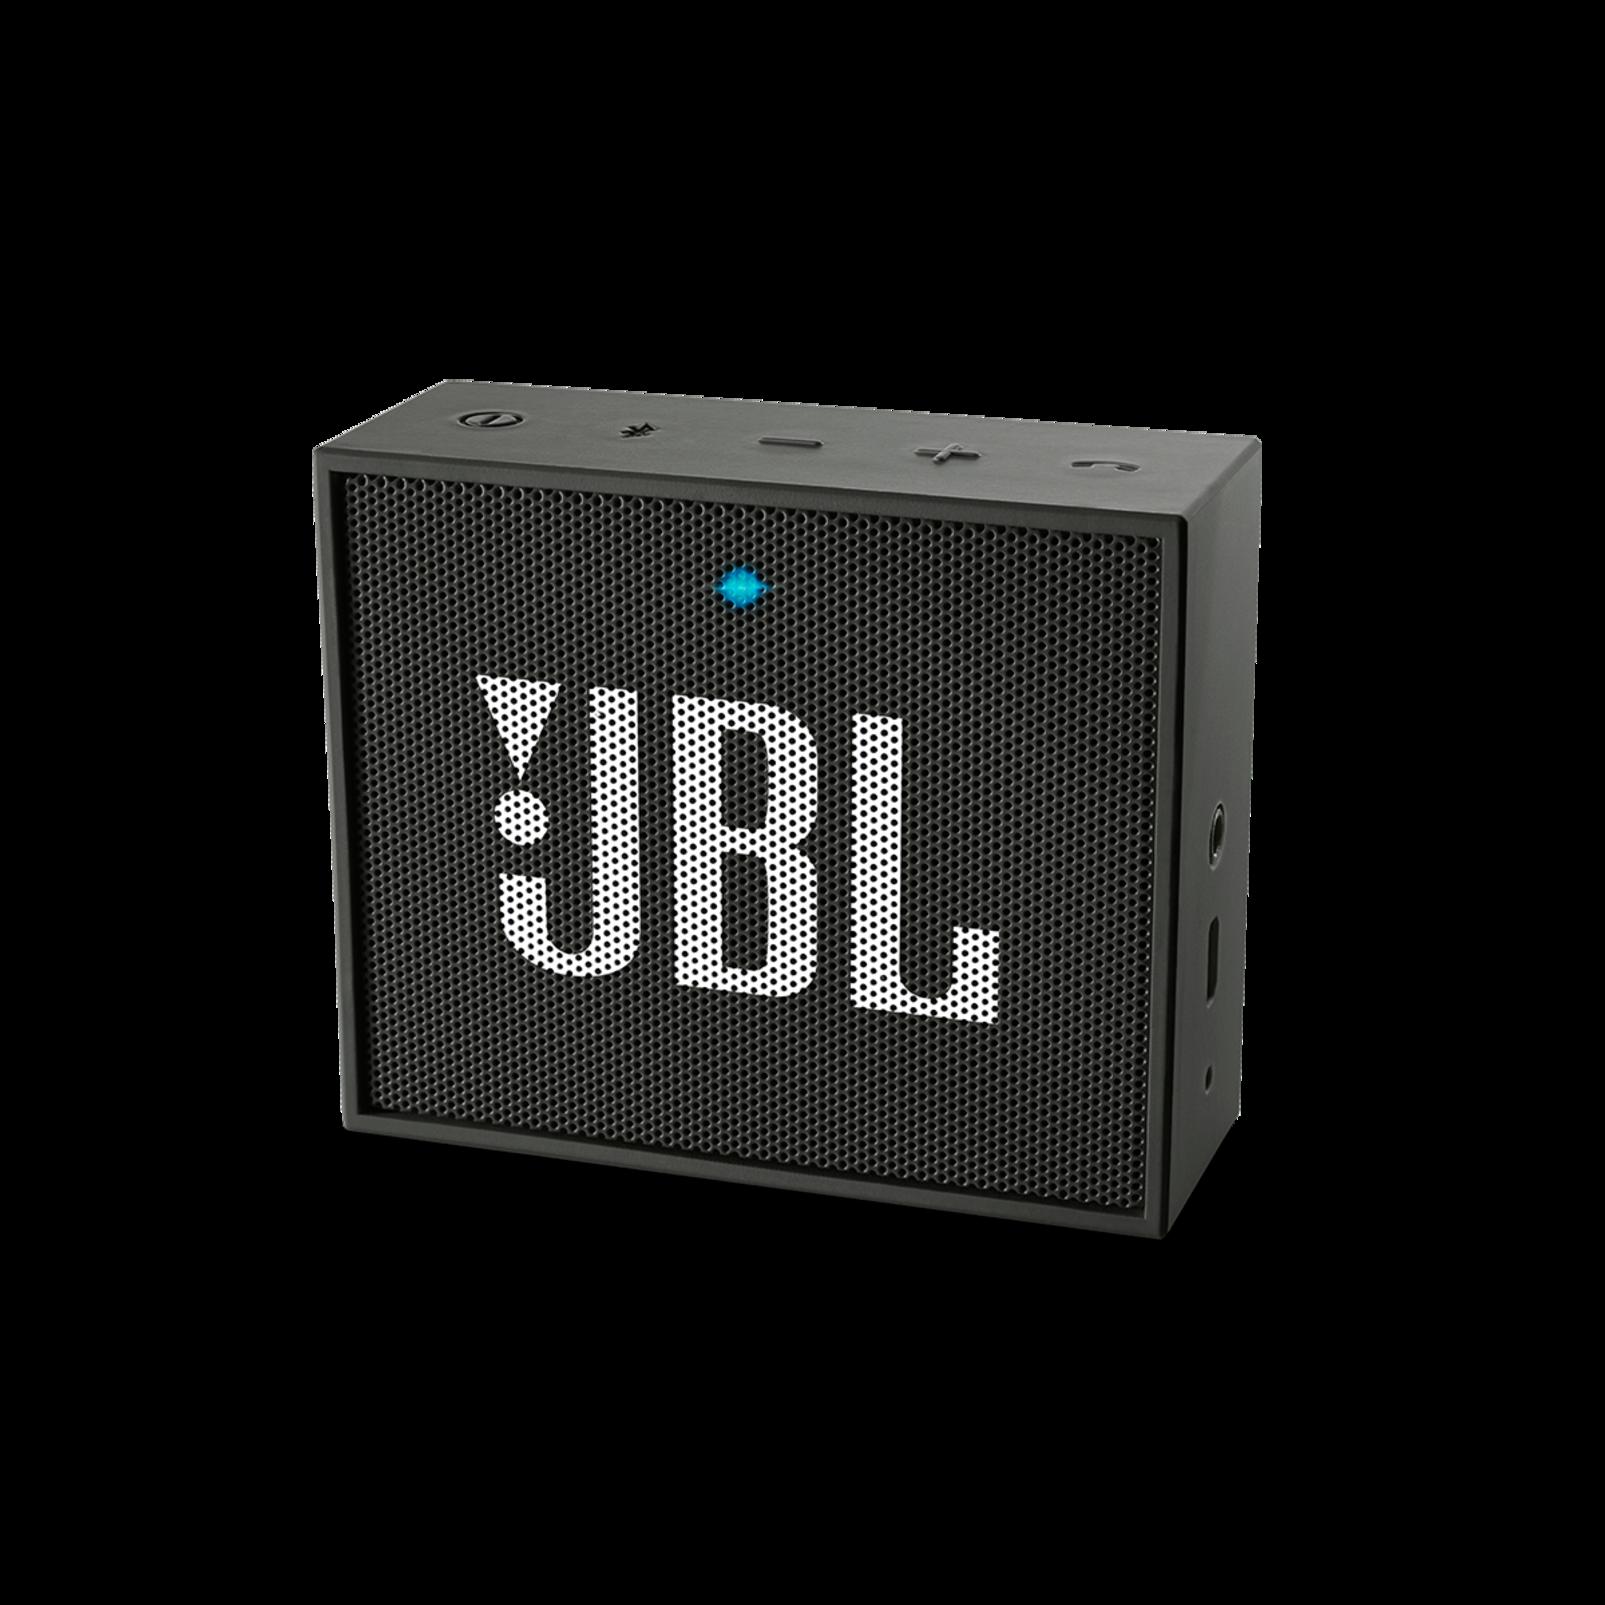 jbl go full featured great sounding great value portable speaker rh uk jbl com jbl xtreme bluetooth speaker user manual jbl bluetooth speaker instruction manual